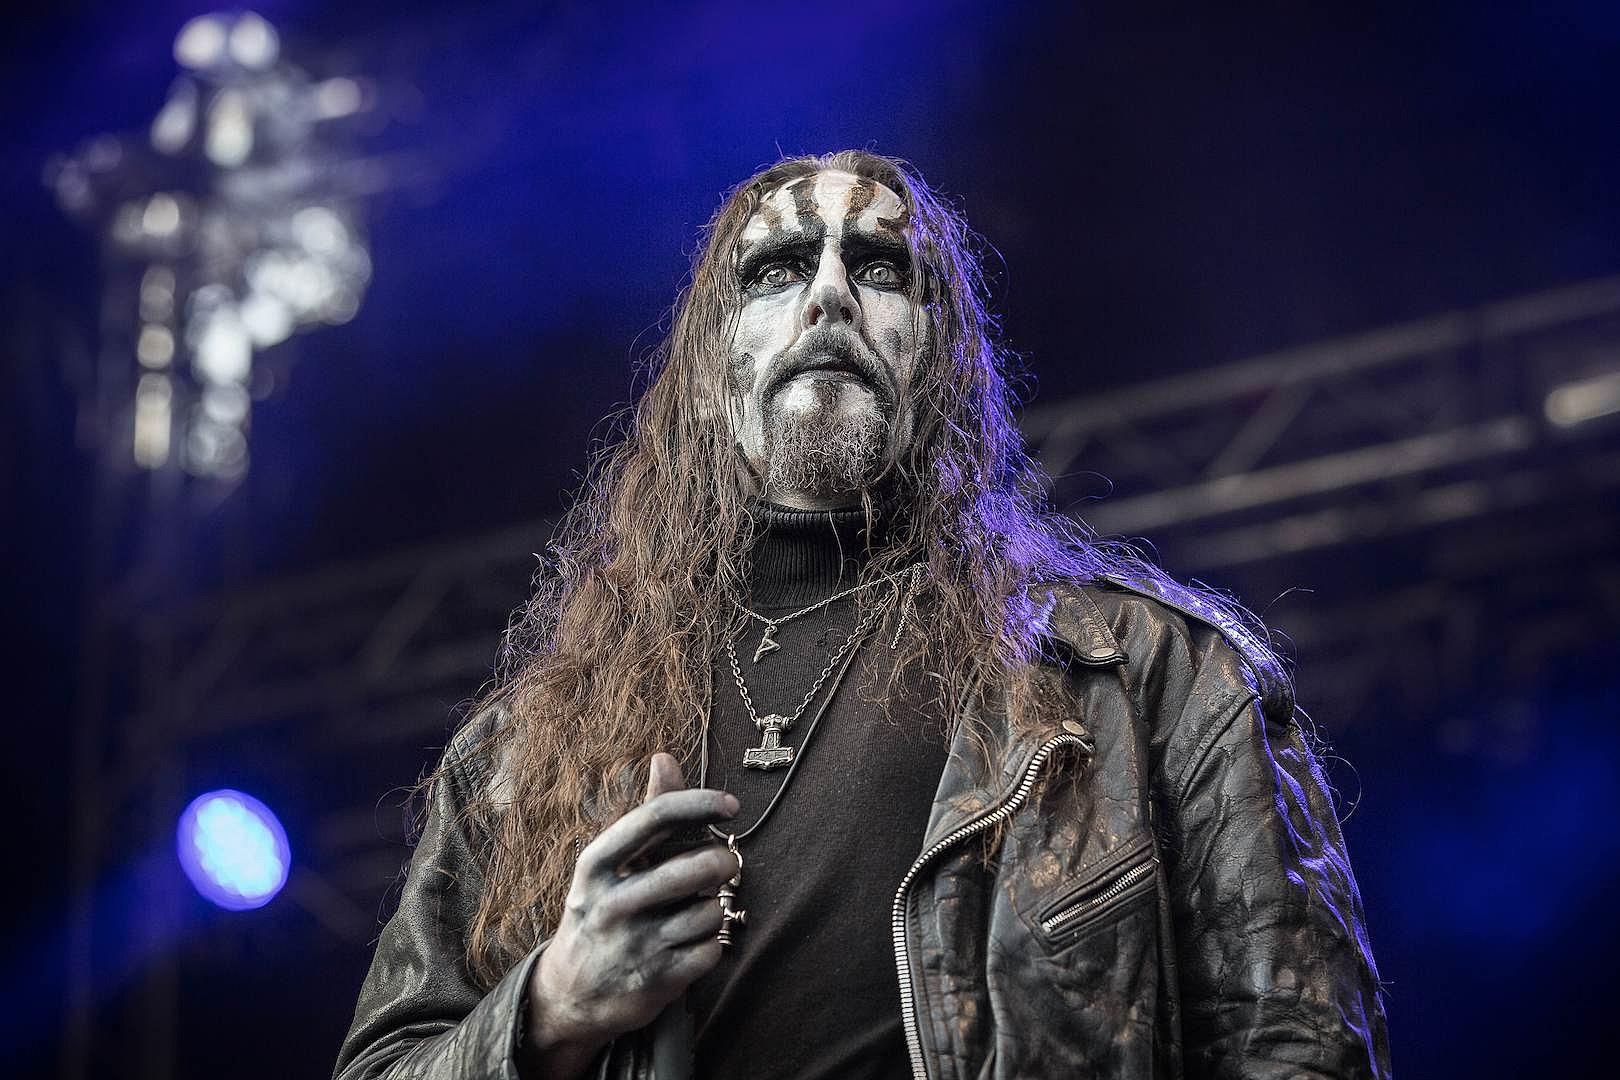 Geezer Butler on Black Sabbath Reunion: 'I Wouldn't Say Never'